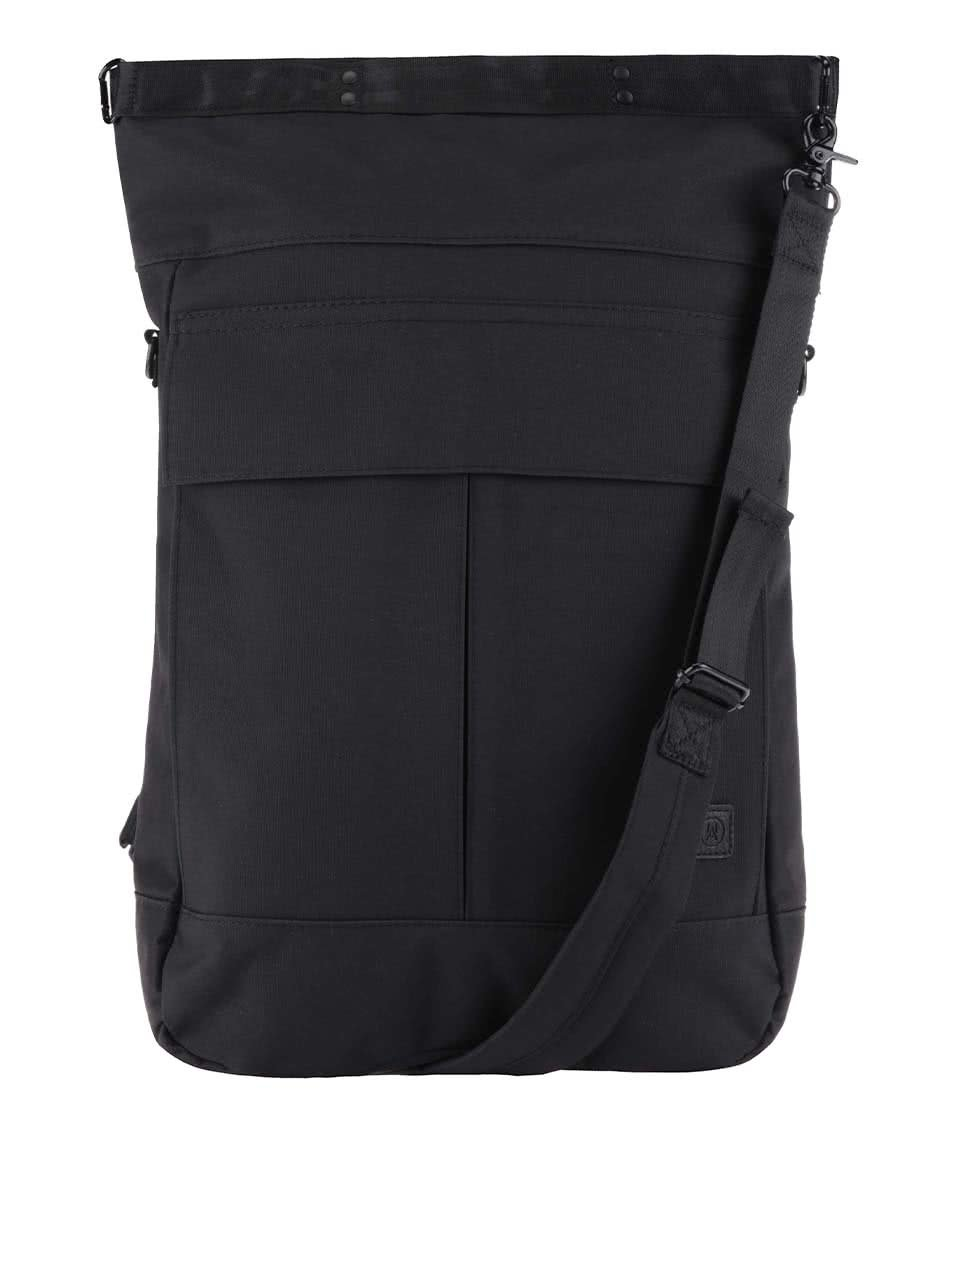 Černý batoh/crossbody taška Ucon Declan Waterproof 18 l